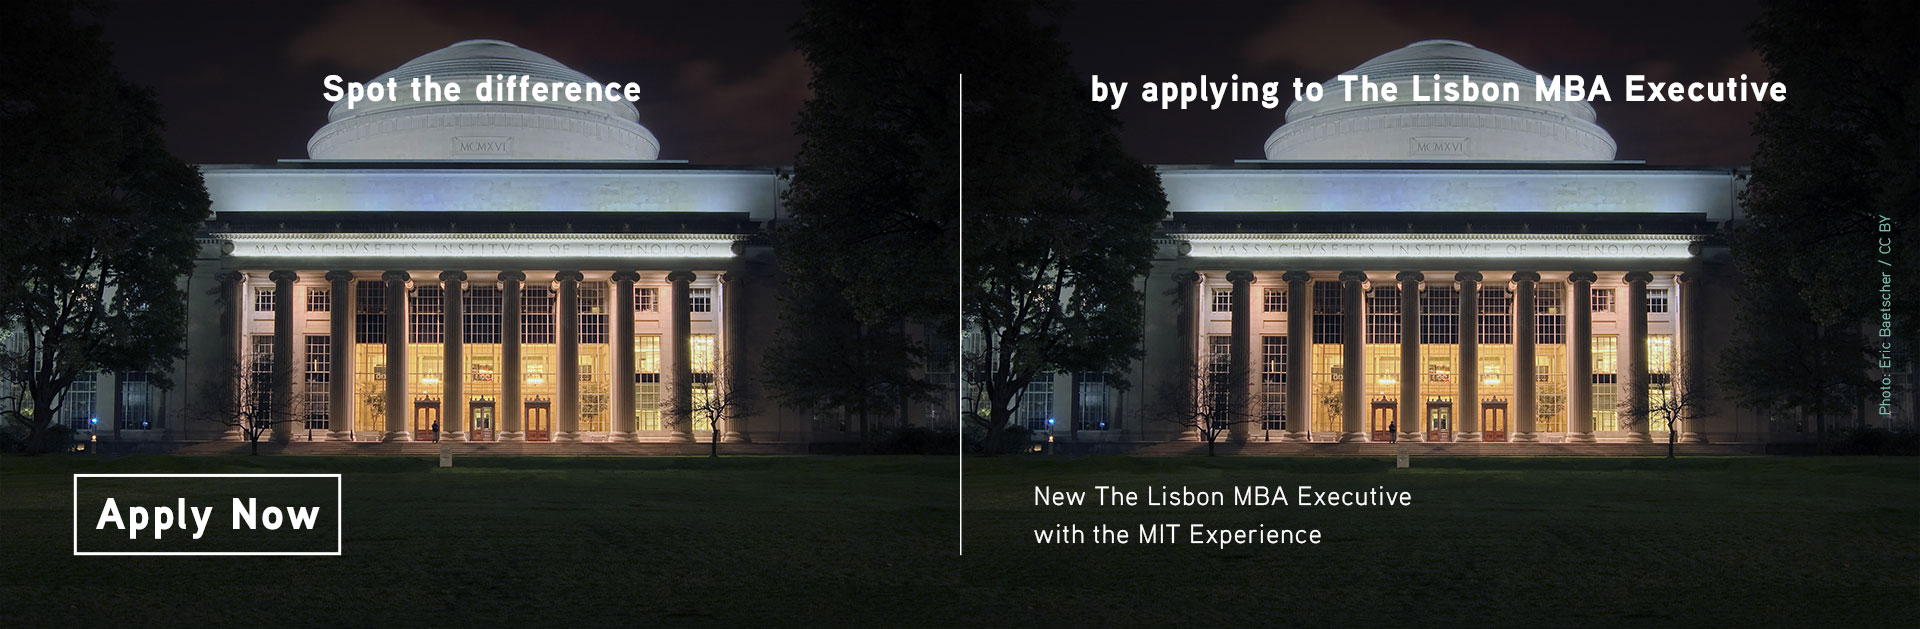 The Lisbon MBA Executive